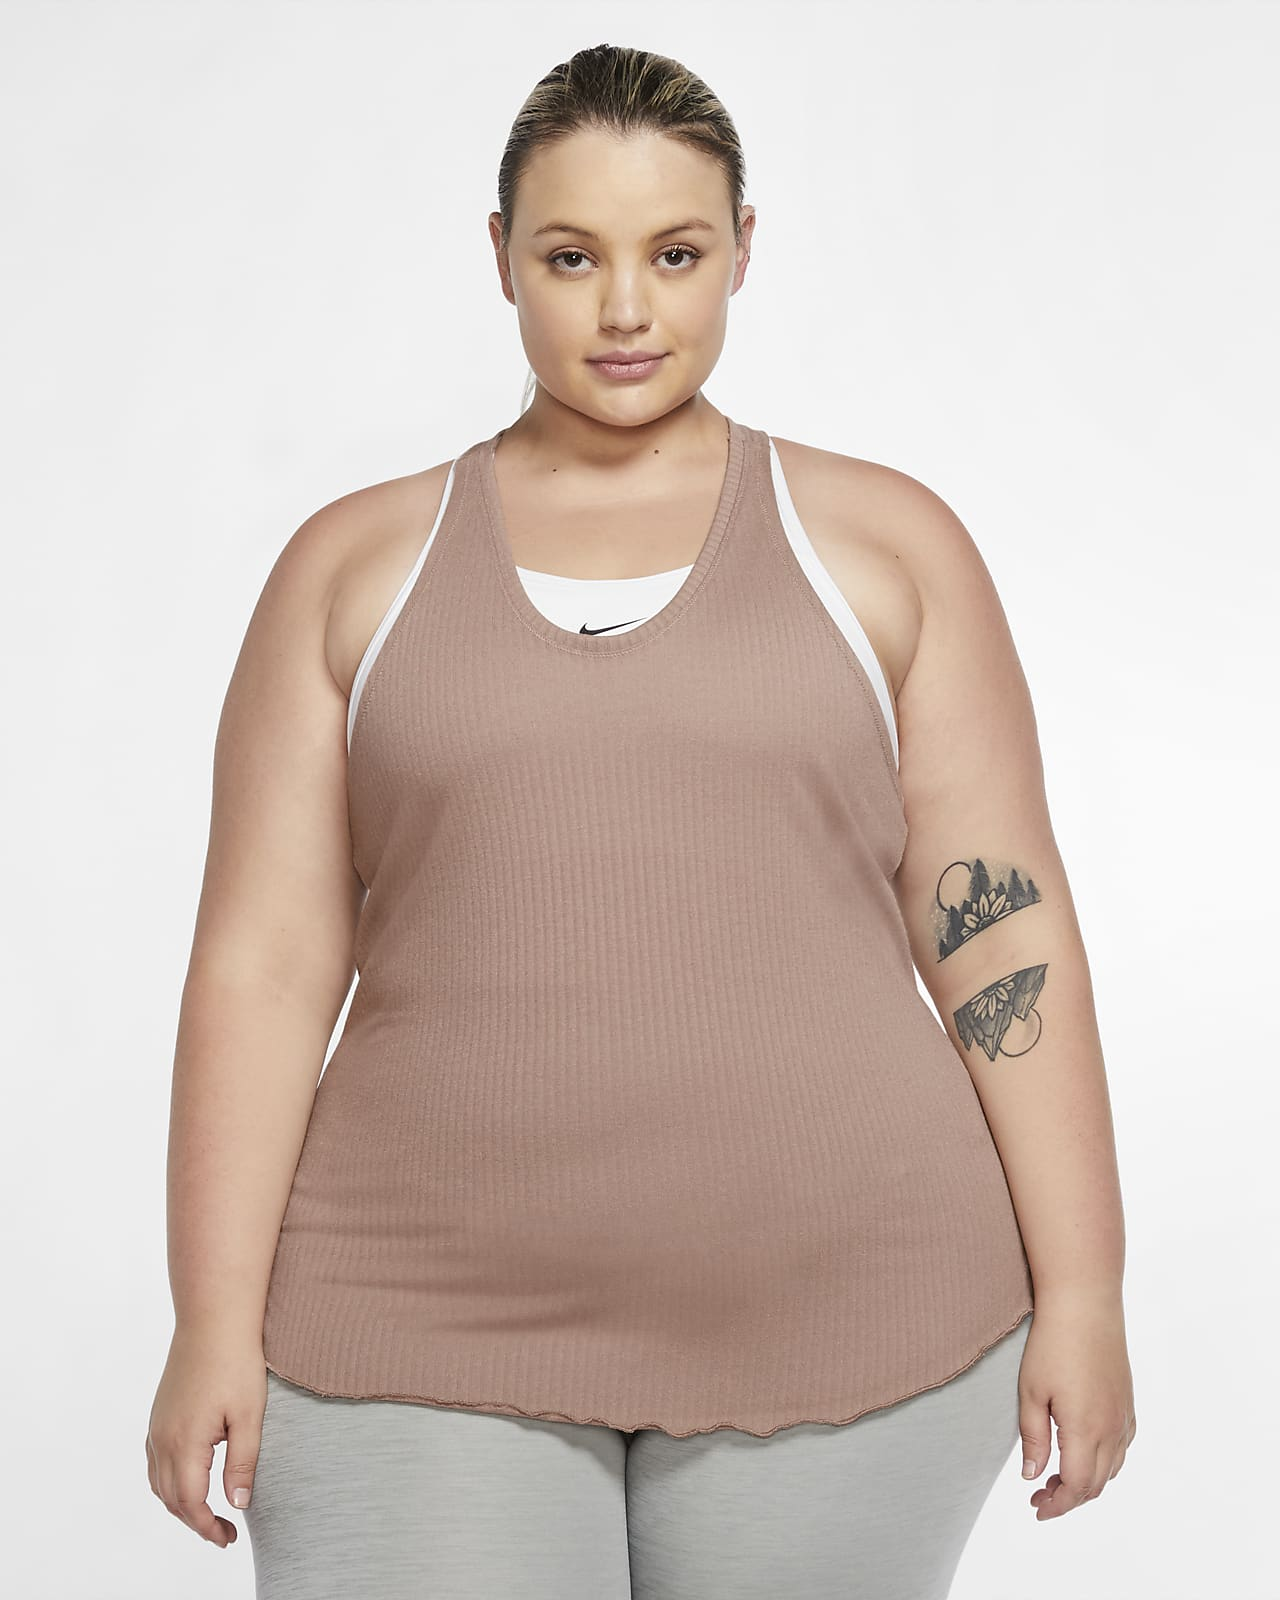 Nike Yoga Women's Tank (Plus Size)